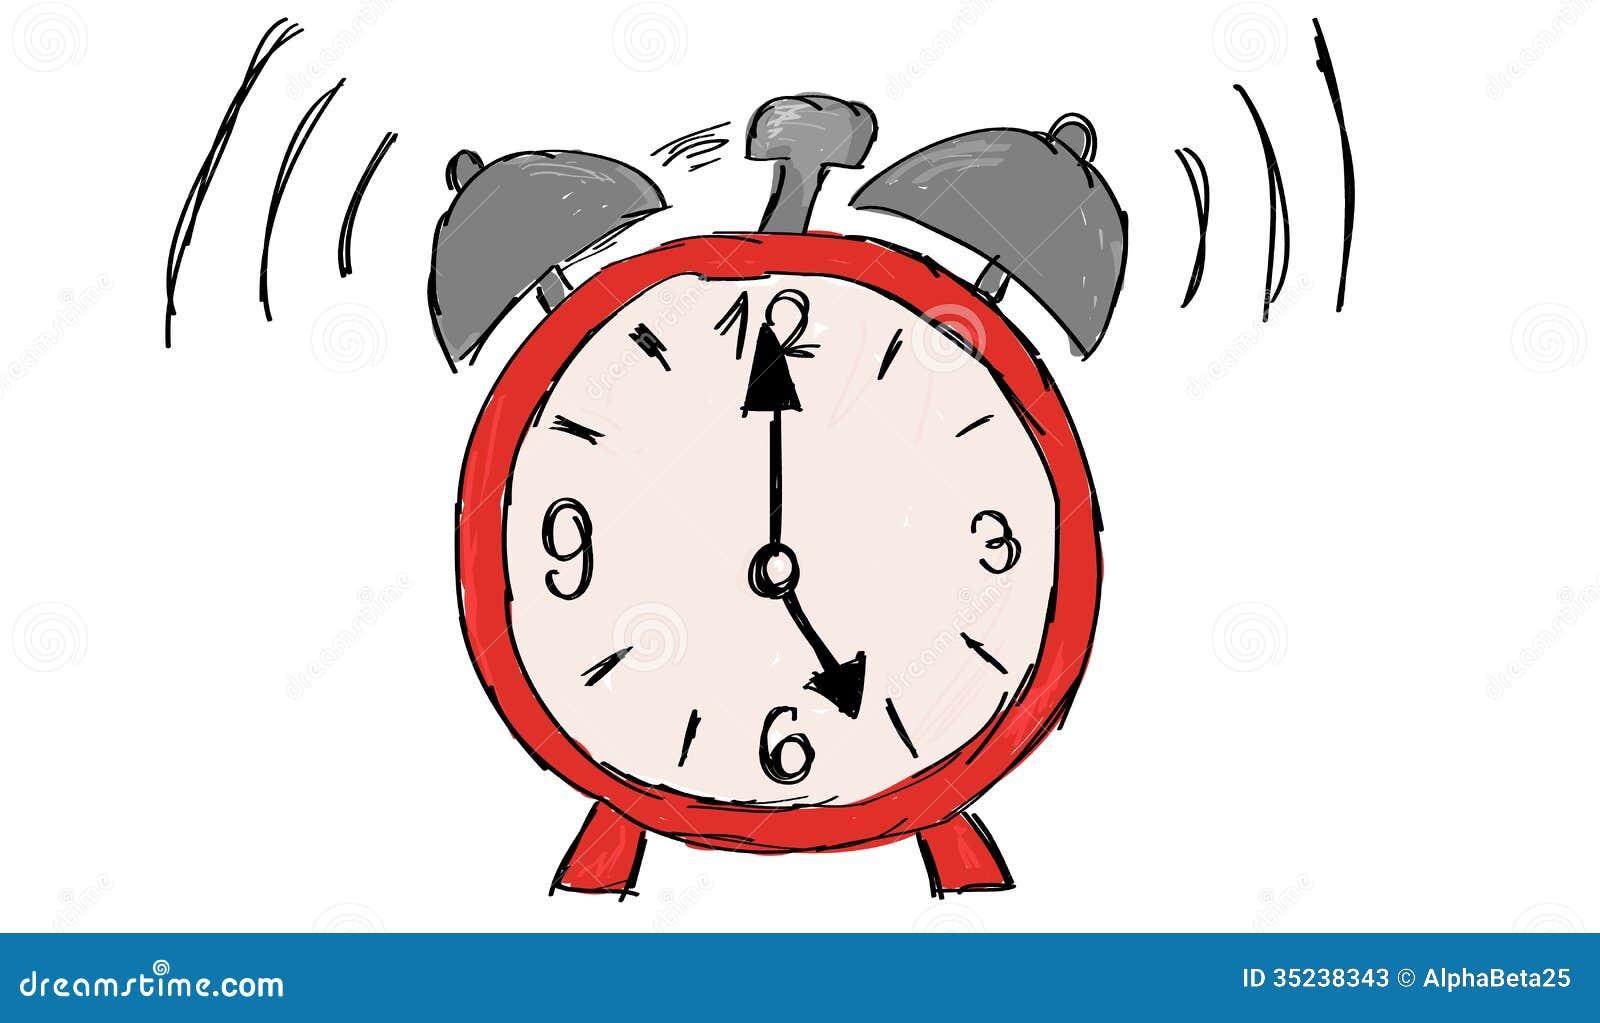 Hand drawn alarm clock stock vector. Illustration of ...